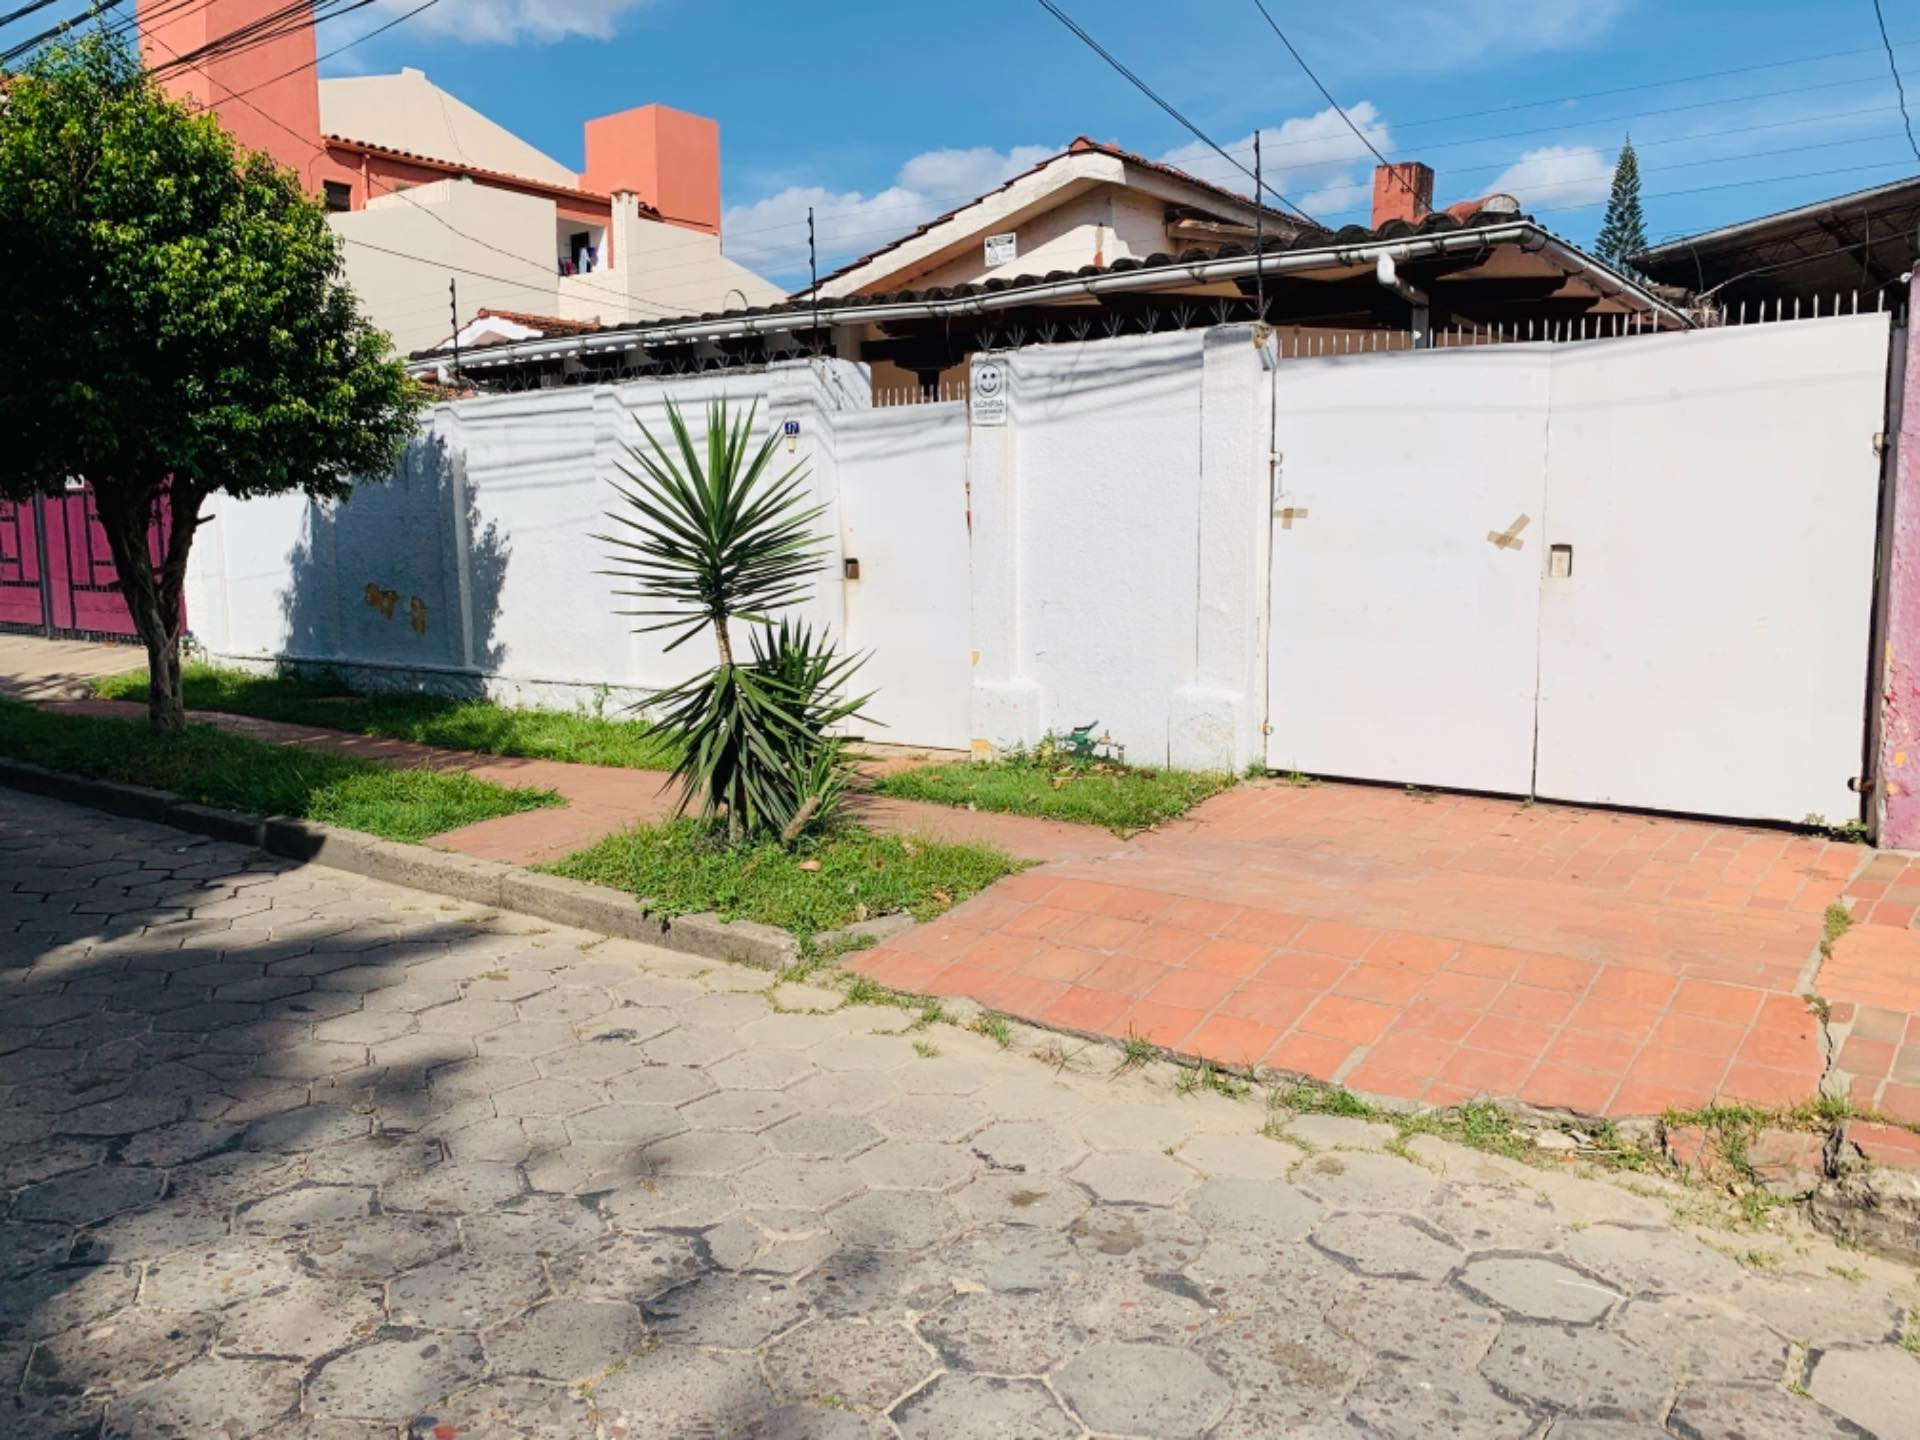 Casa en Alquiler Barrio Equipetrol entre 3er y 4to Anillo Foto 1